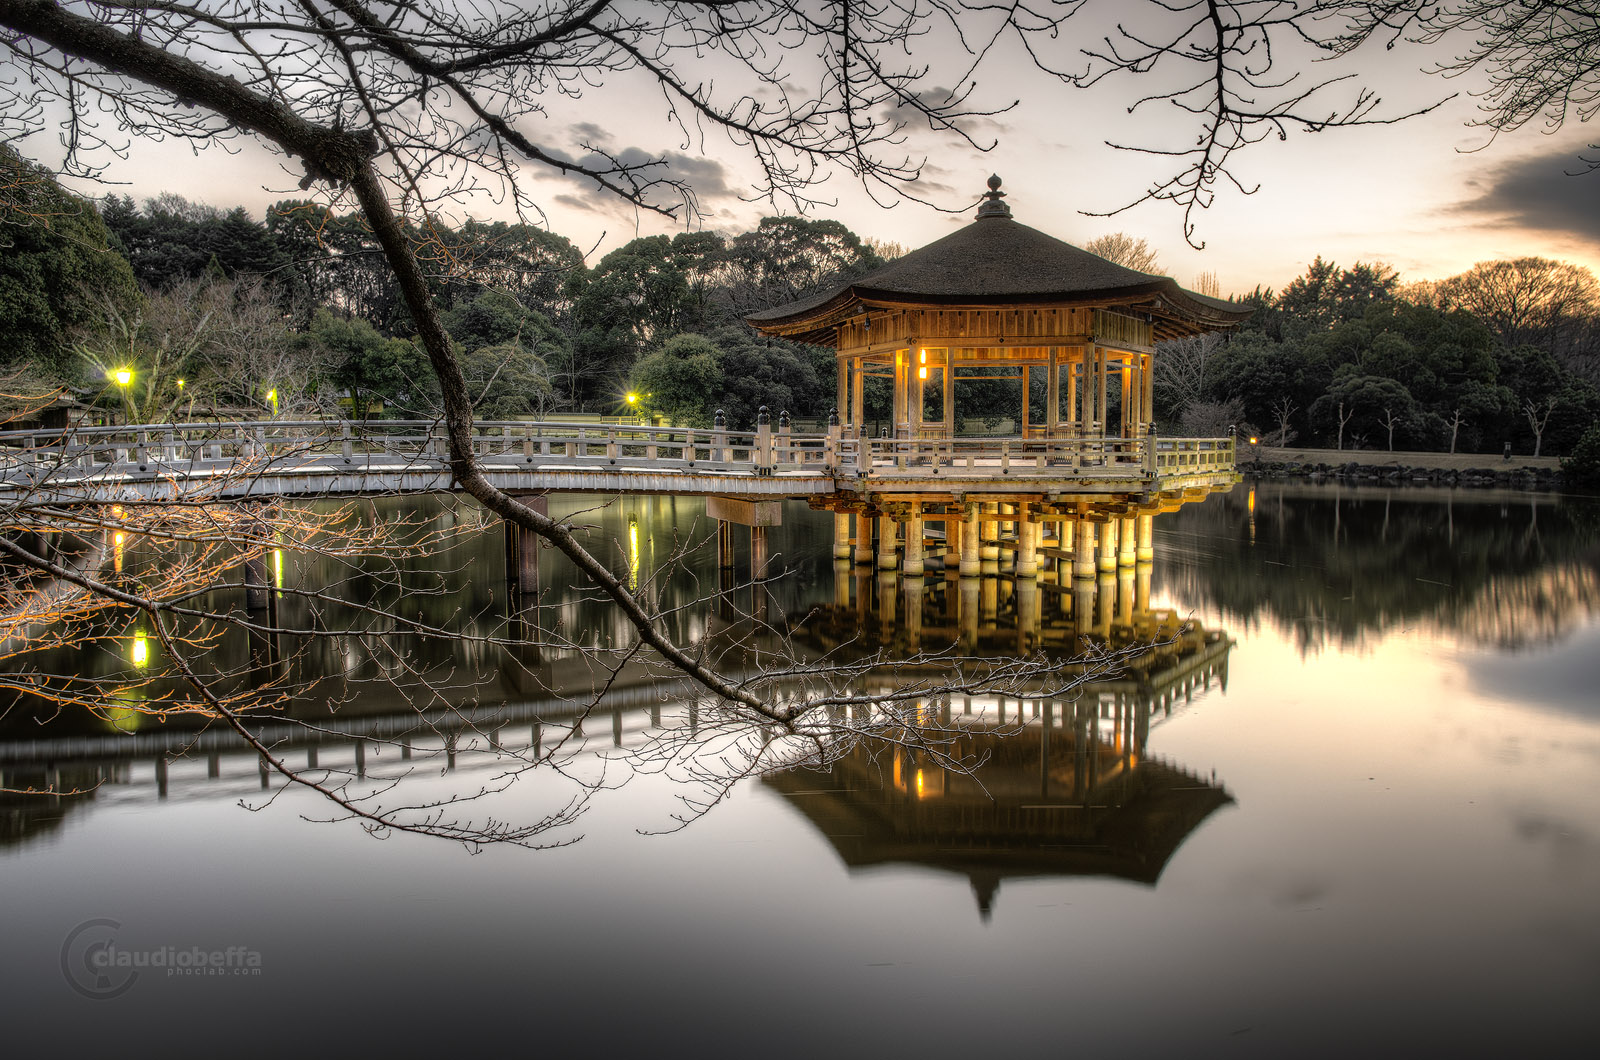 Floating Pavilion Lake Reflection Bridge Tree Sunset Nara Landscape HDR Japan Pentax